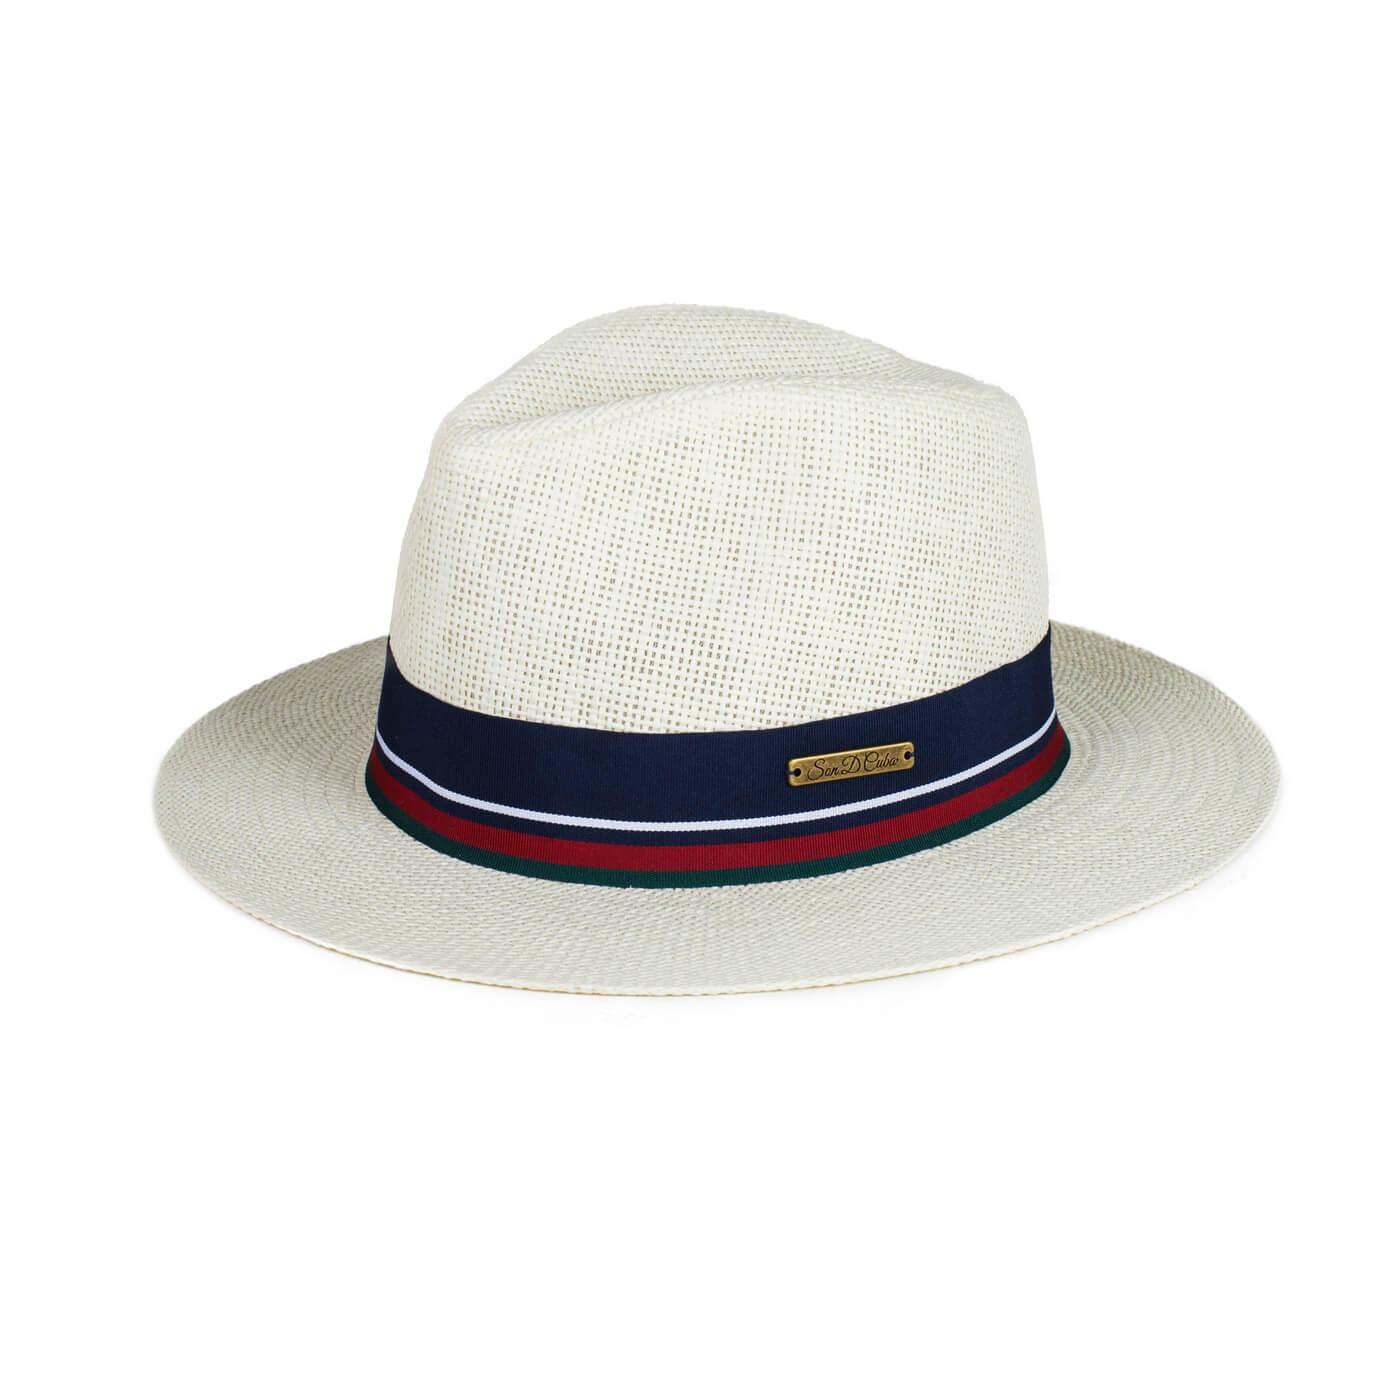 48481b43586 Havana Summer Straw Hat